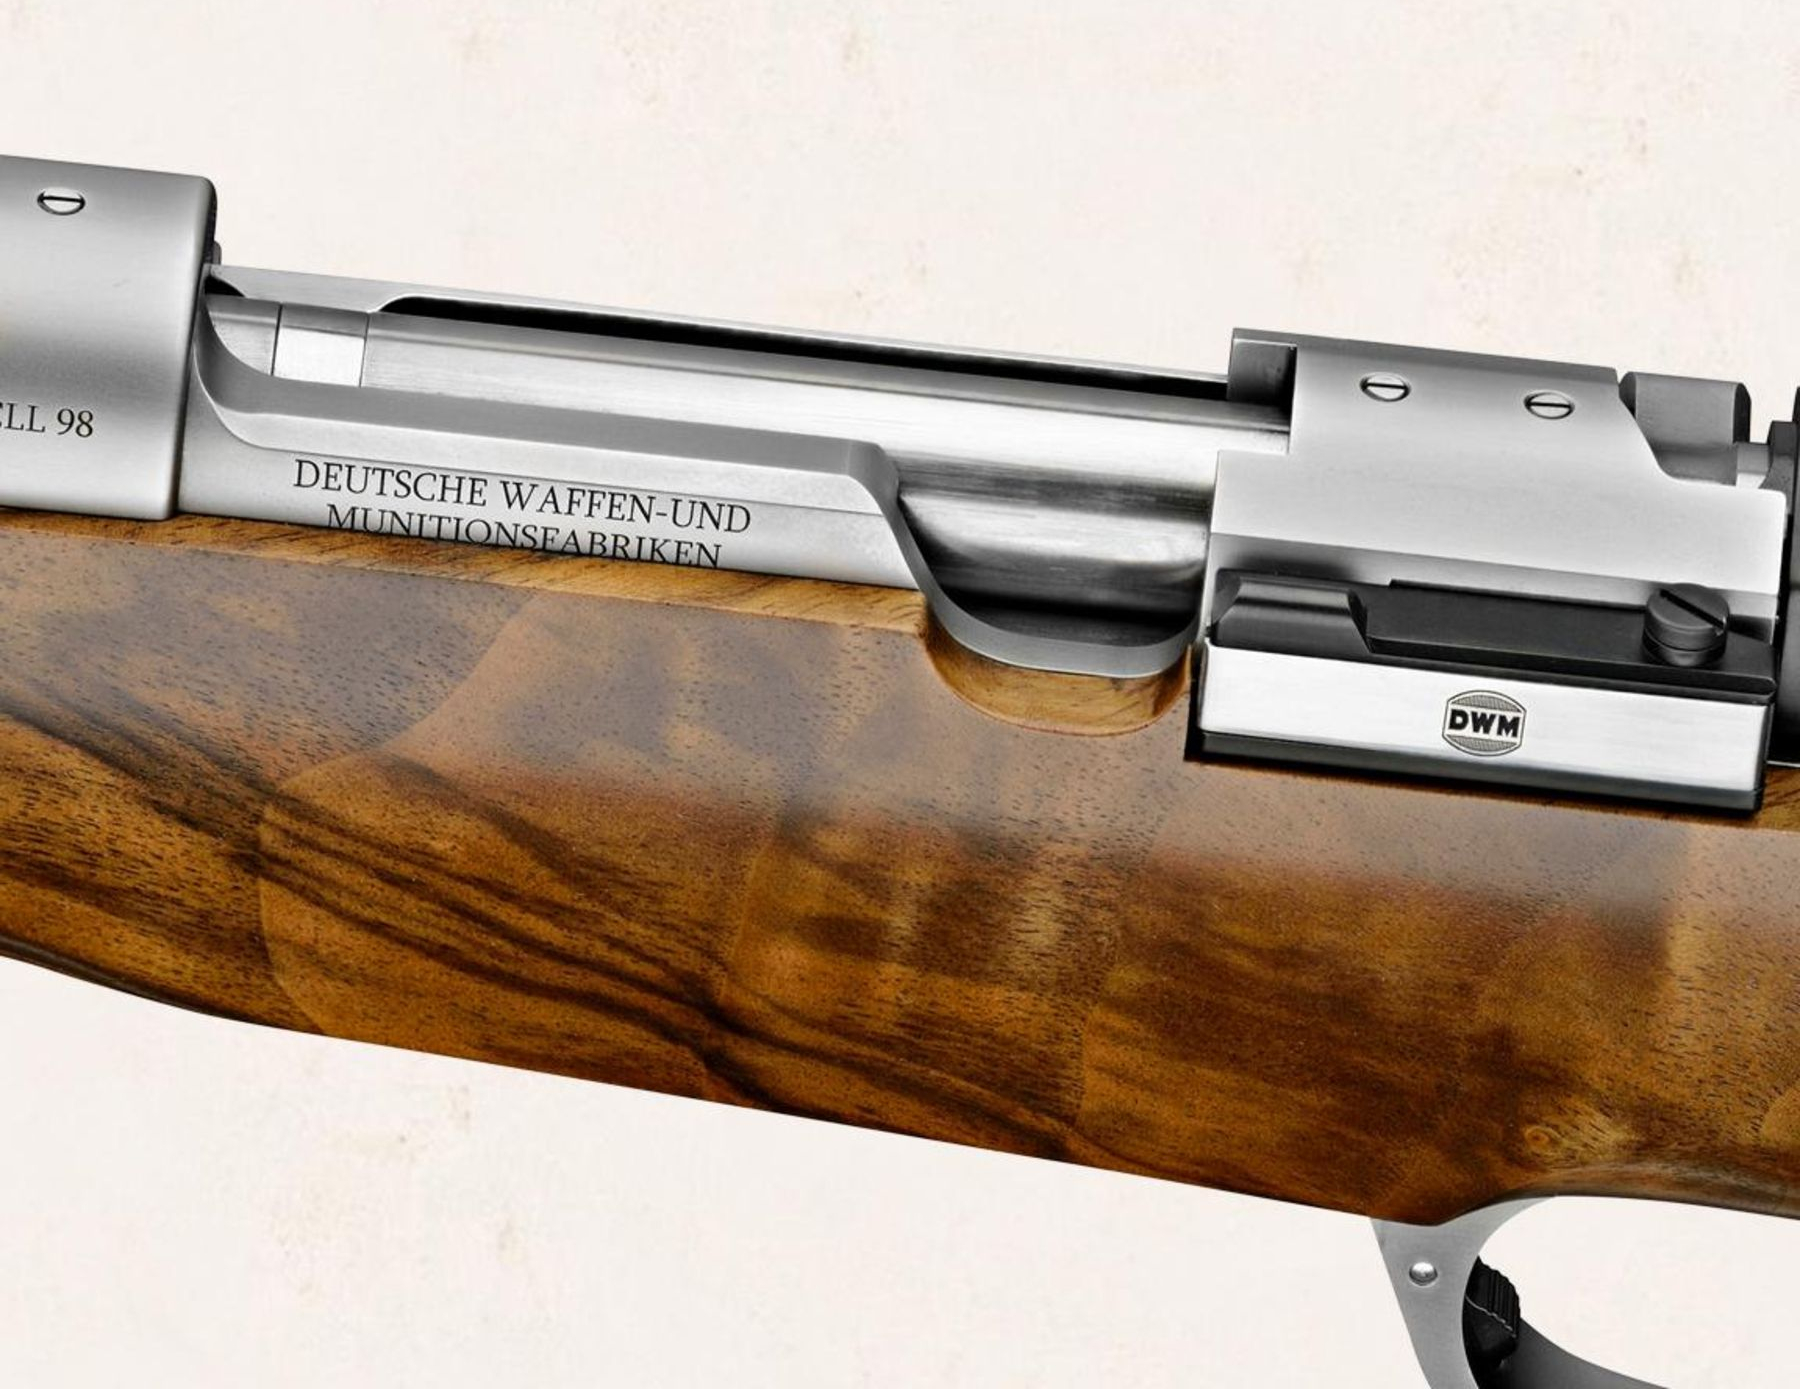 Mauser M98 DWM rifle